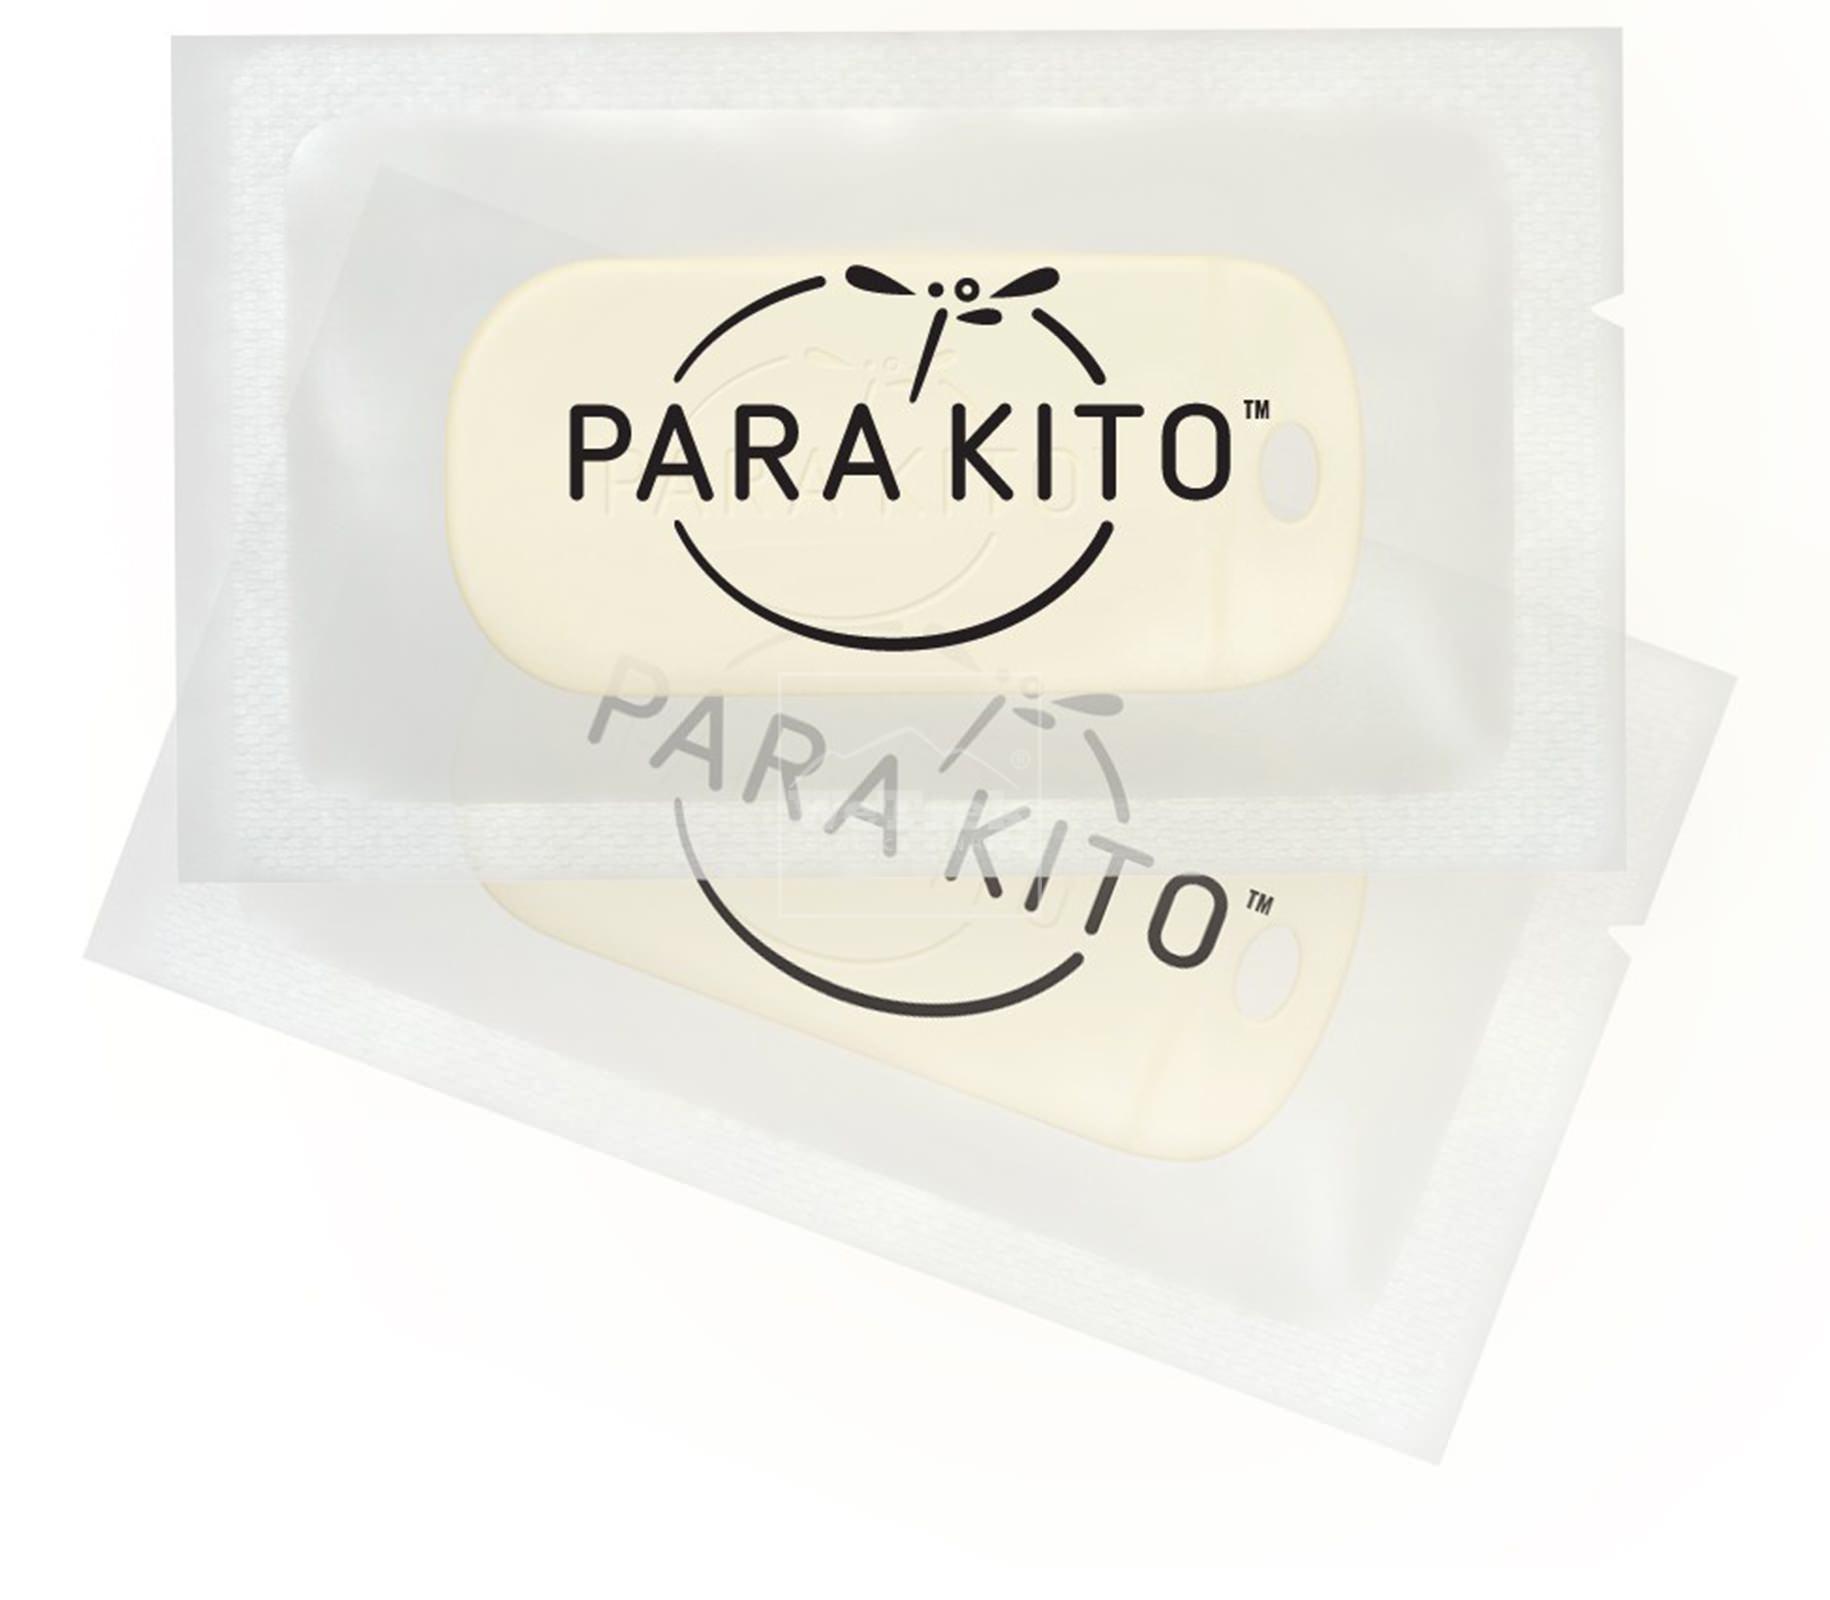 sap-chong-muoi-kem-vong-tay-tre-em-parakito-sea-world-kids-band-7501-wetrek.vn-3